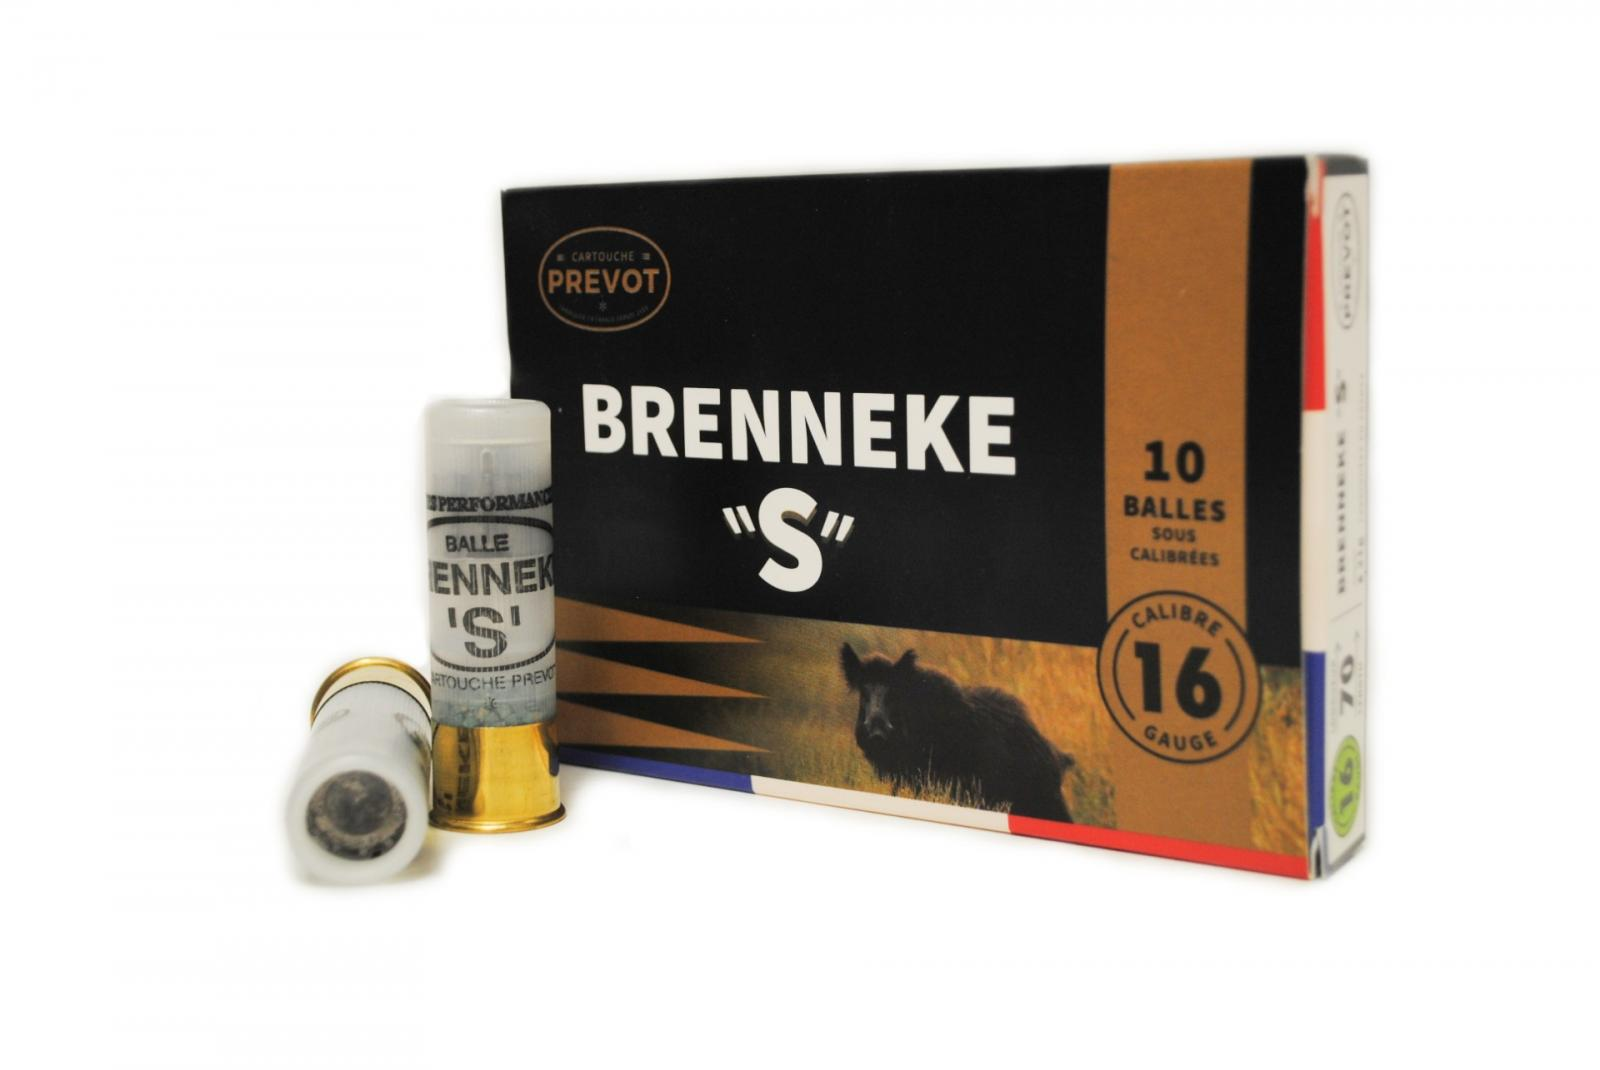 "Boite de 10 balles BRENNEKE ""S"" calibre 16 BR2S"